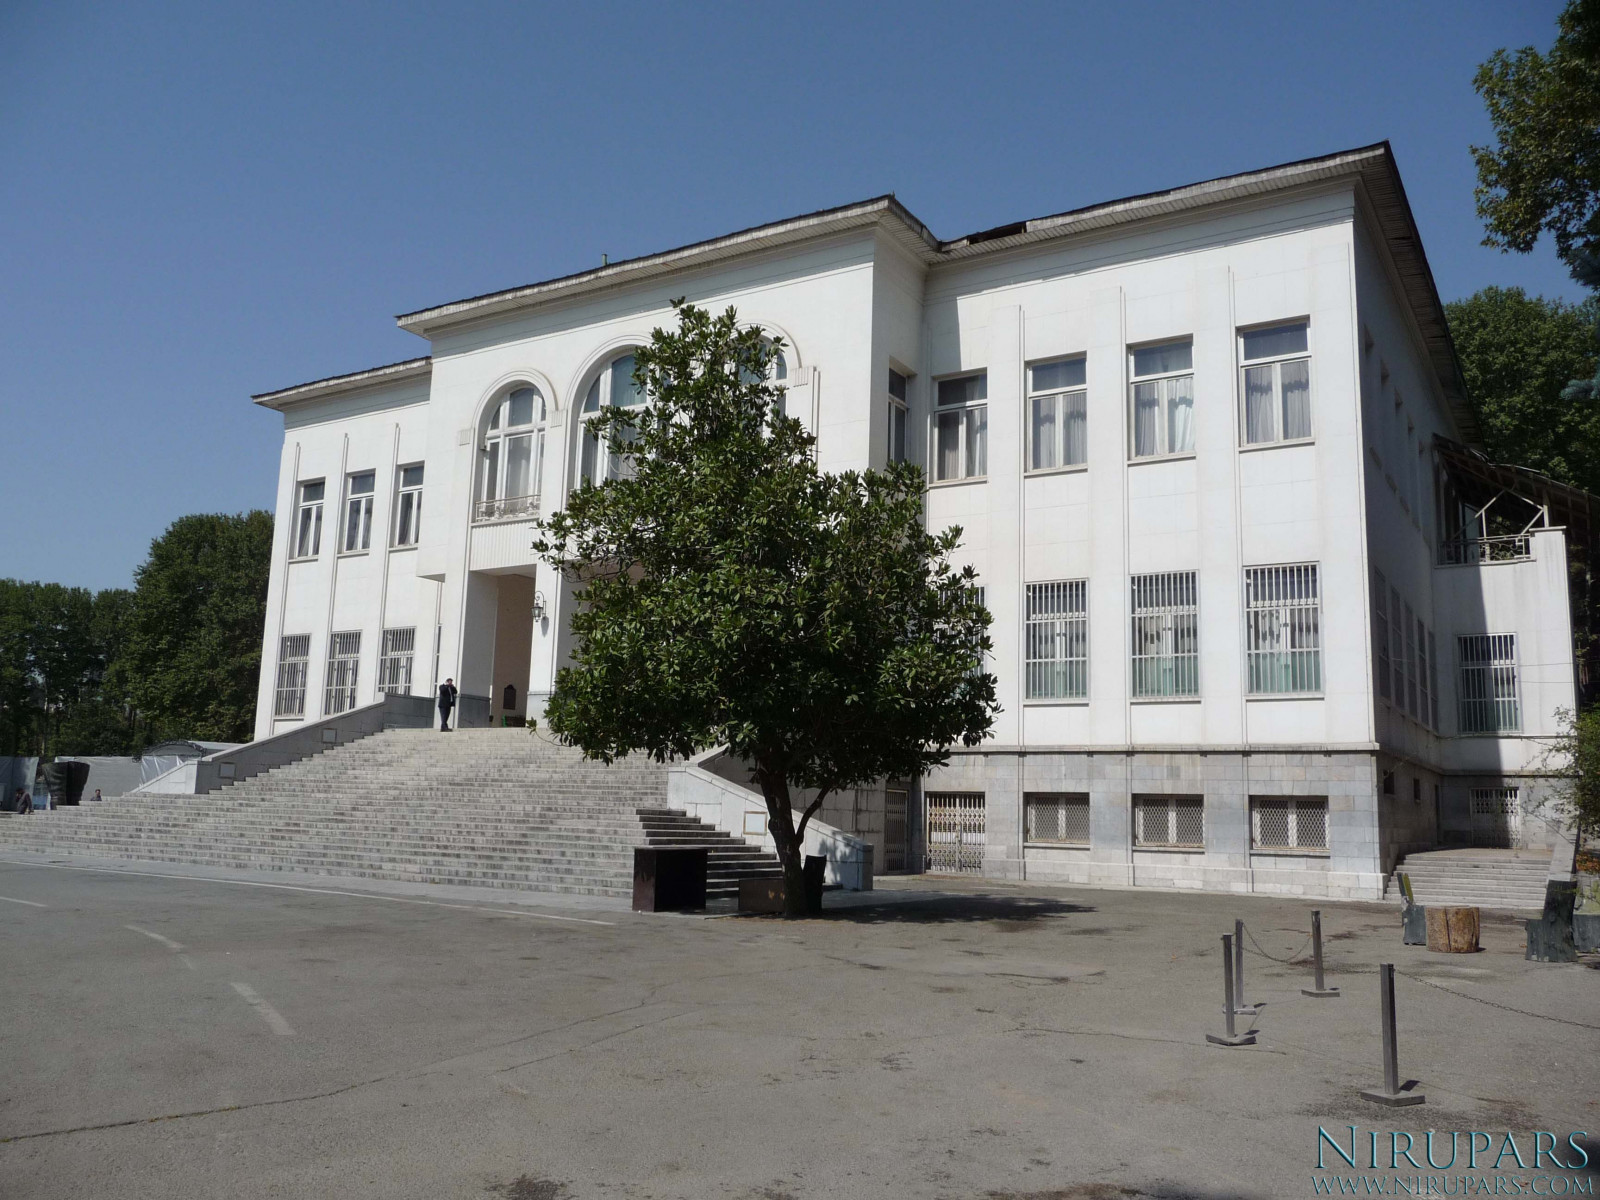 Sadabad Palace Complex - White Palace